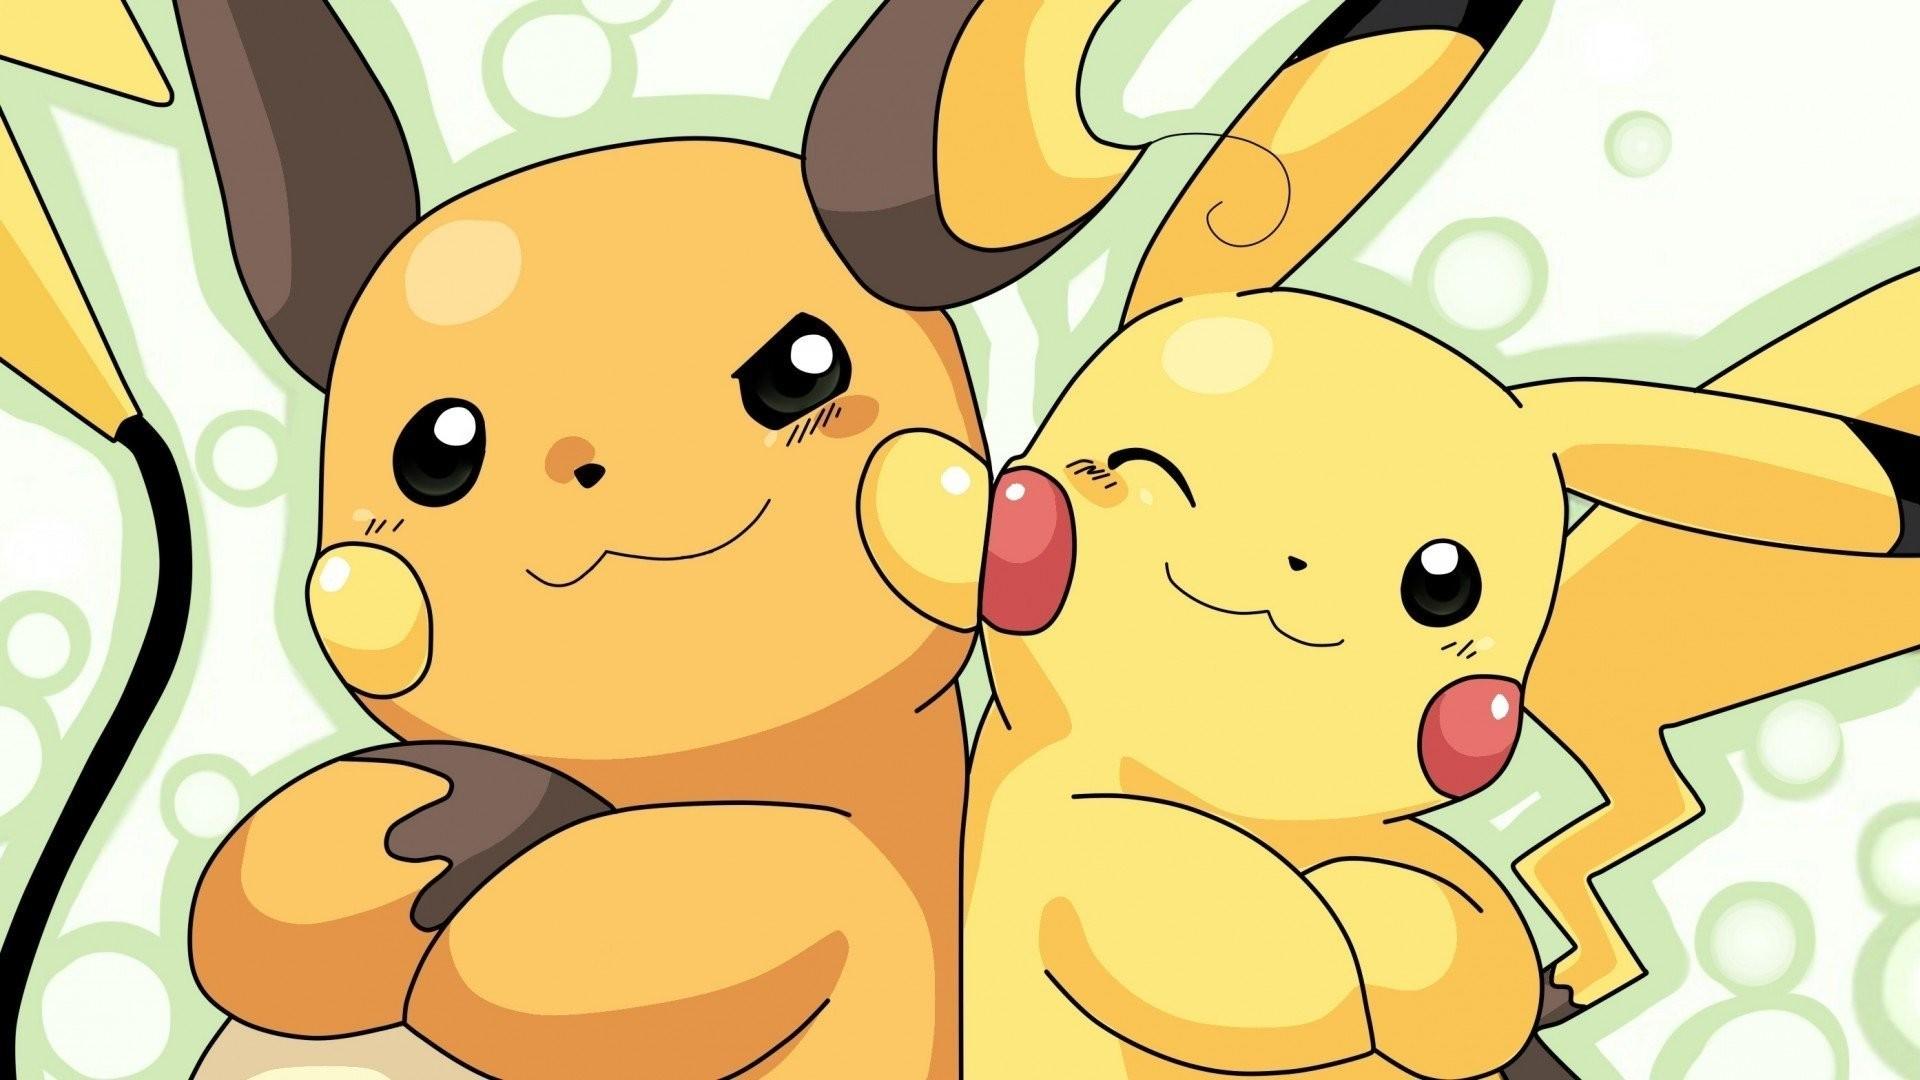 Anime РPok̩mon Pikachu Raichu (Pok̩mon) Wallpaper